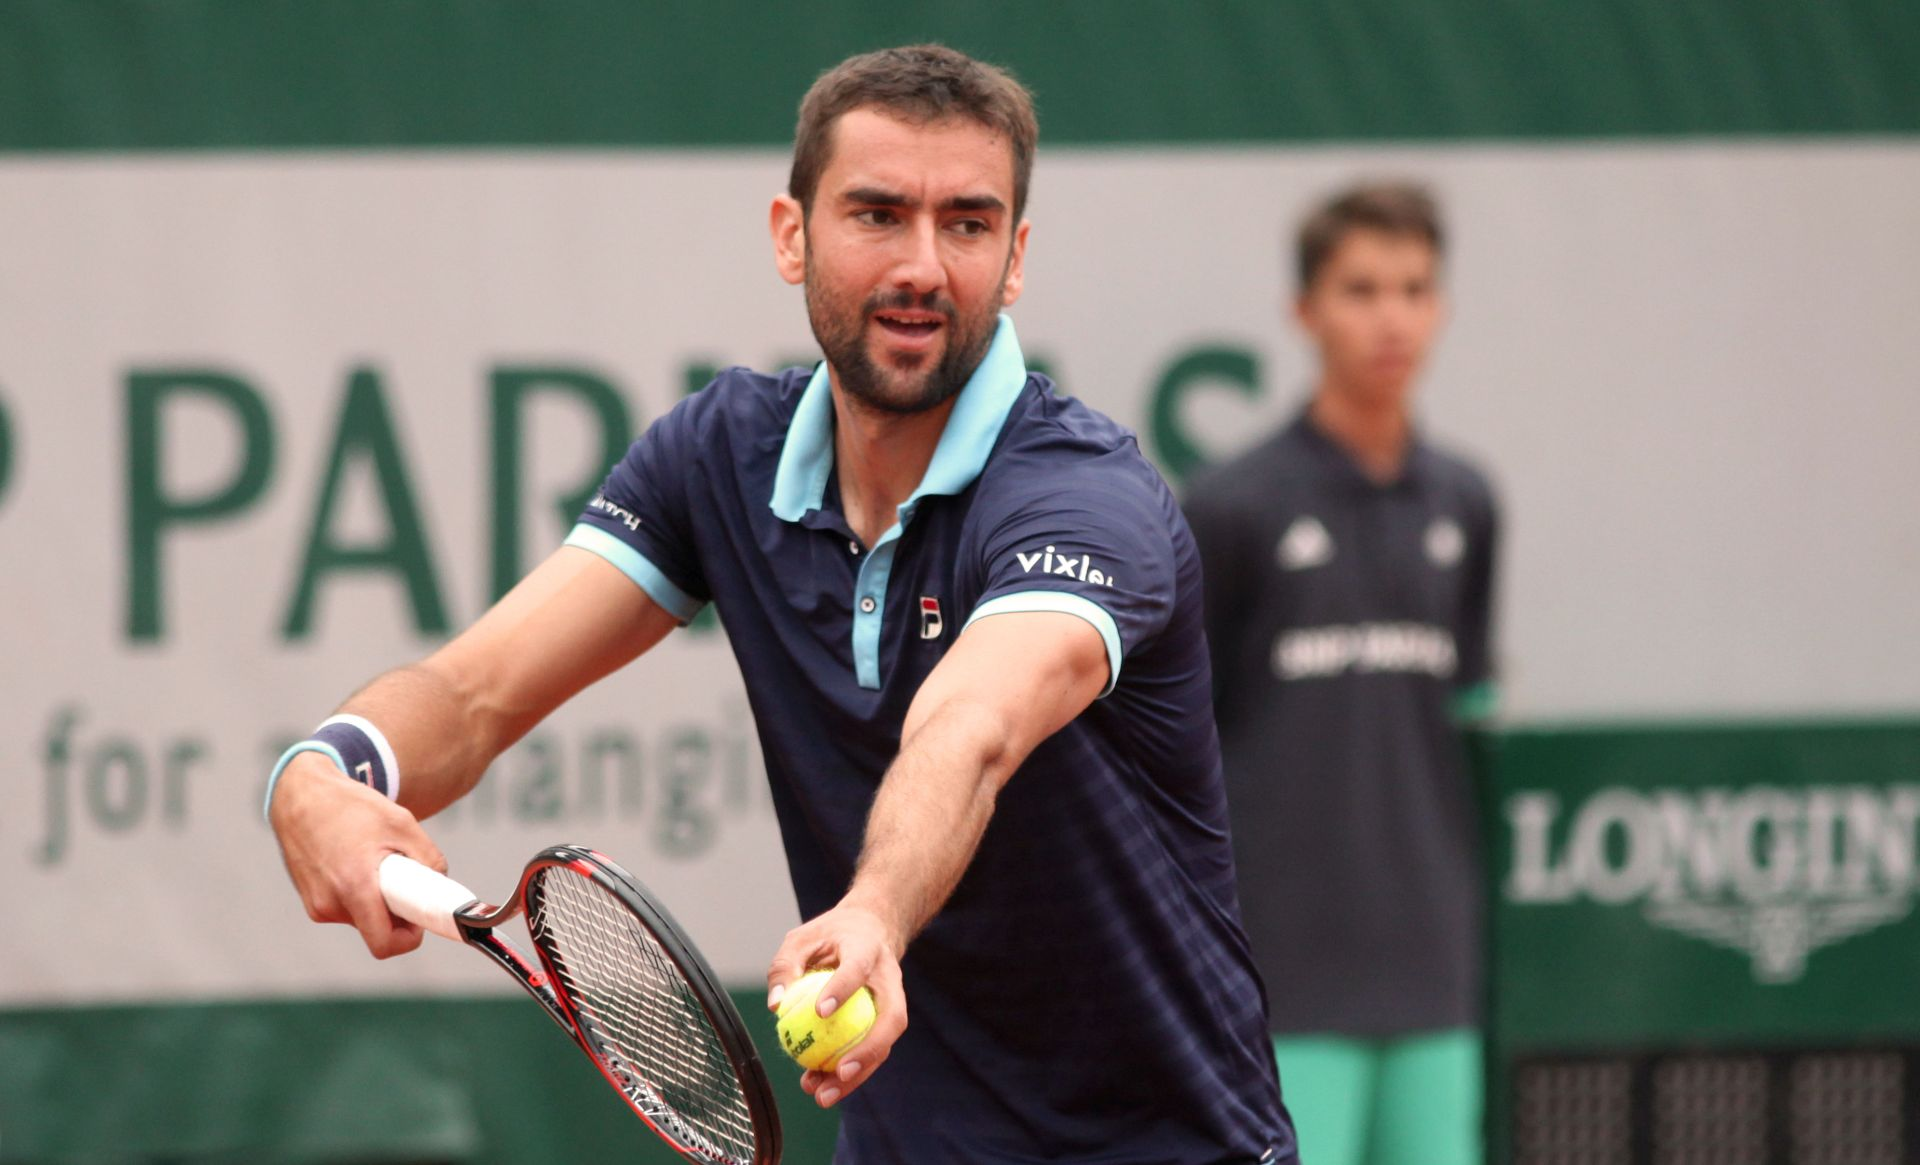 ROLAND GARROS Čilić – Wawrinka treći na 'S. Lenglen'